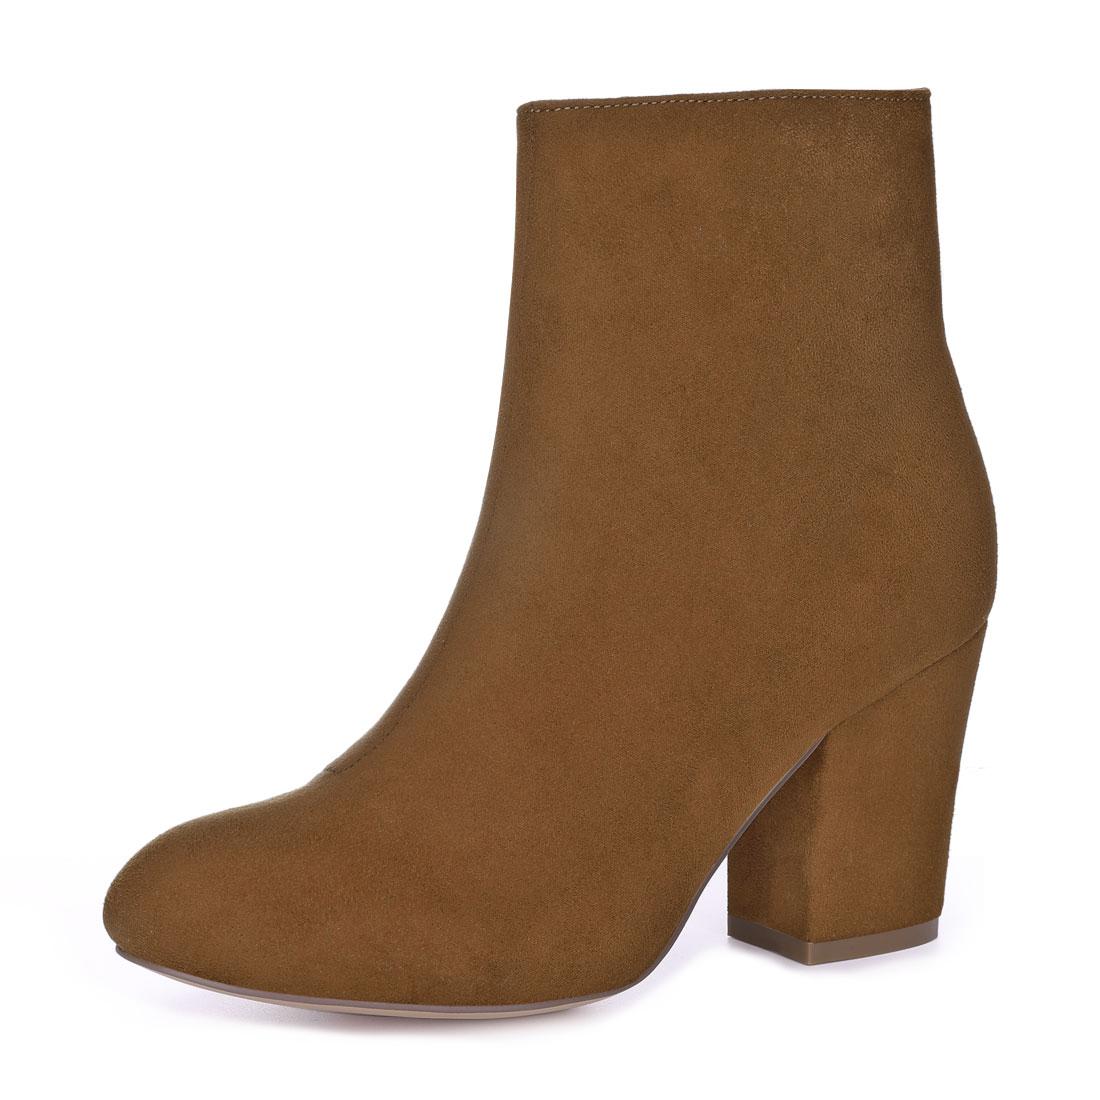 Allegra K Women Round Toe Side Zipper Block Heel Ankle Boots Brown US 9